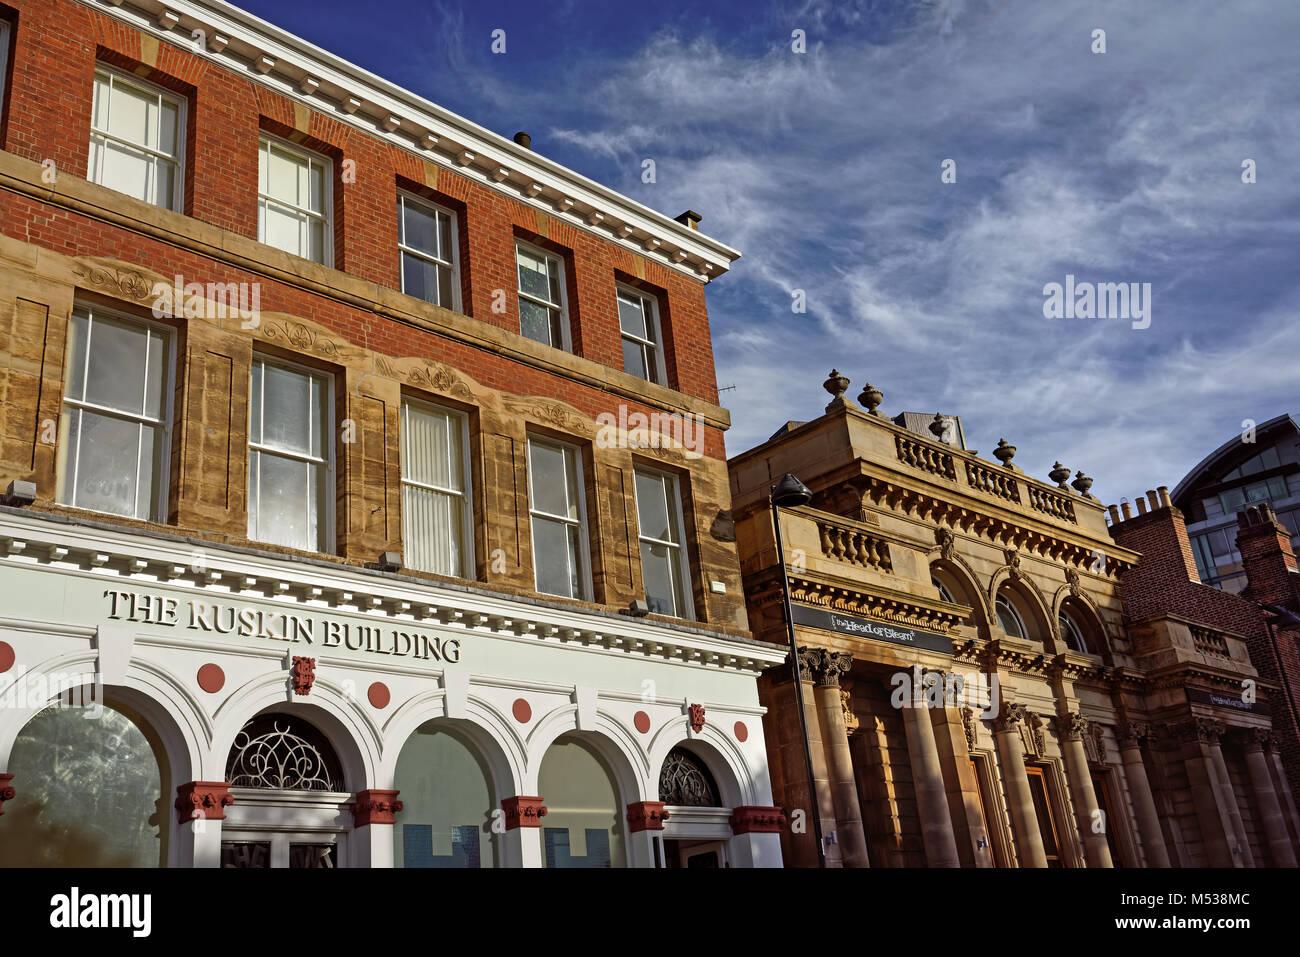 UK,South Yorkshire,Sheffield,Ruskin Building & Fraternity House on Norfolk Street - Stock Image